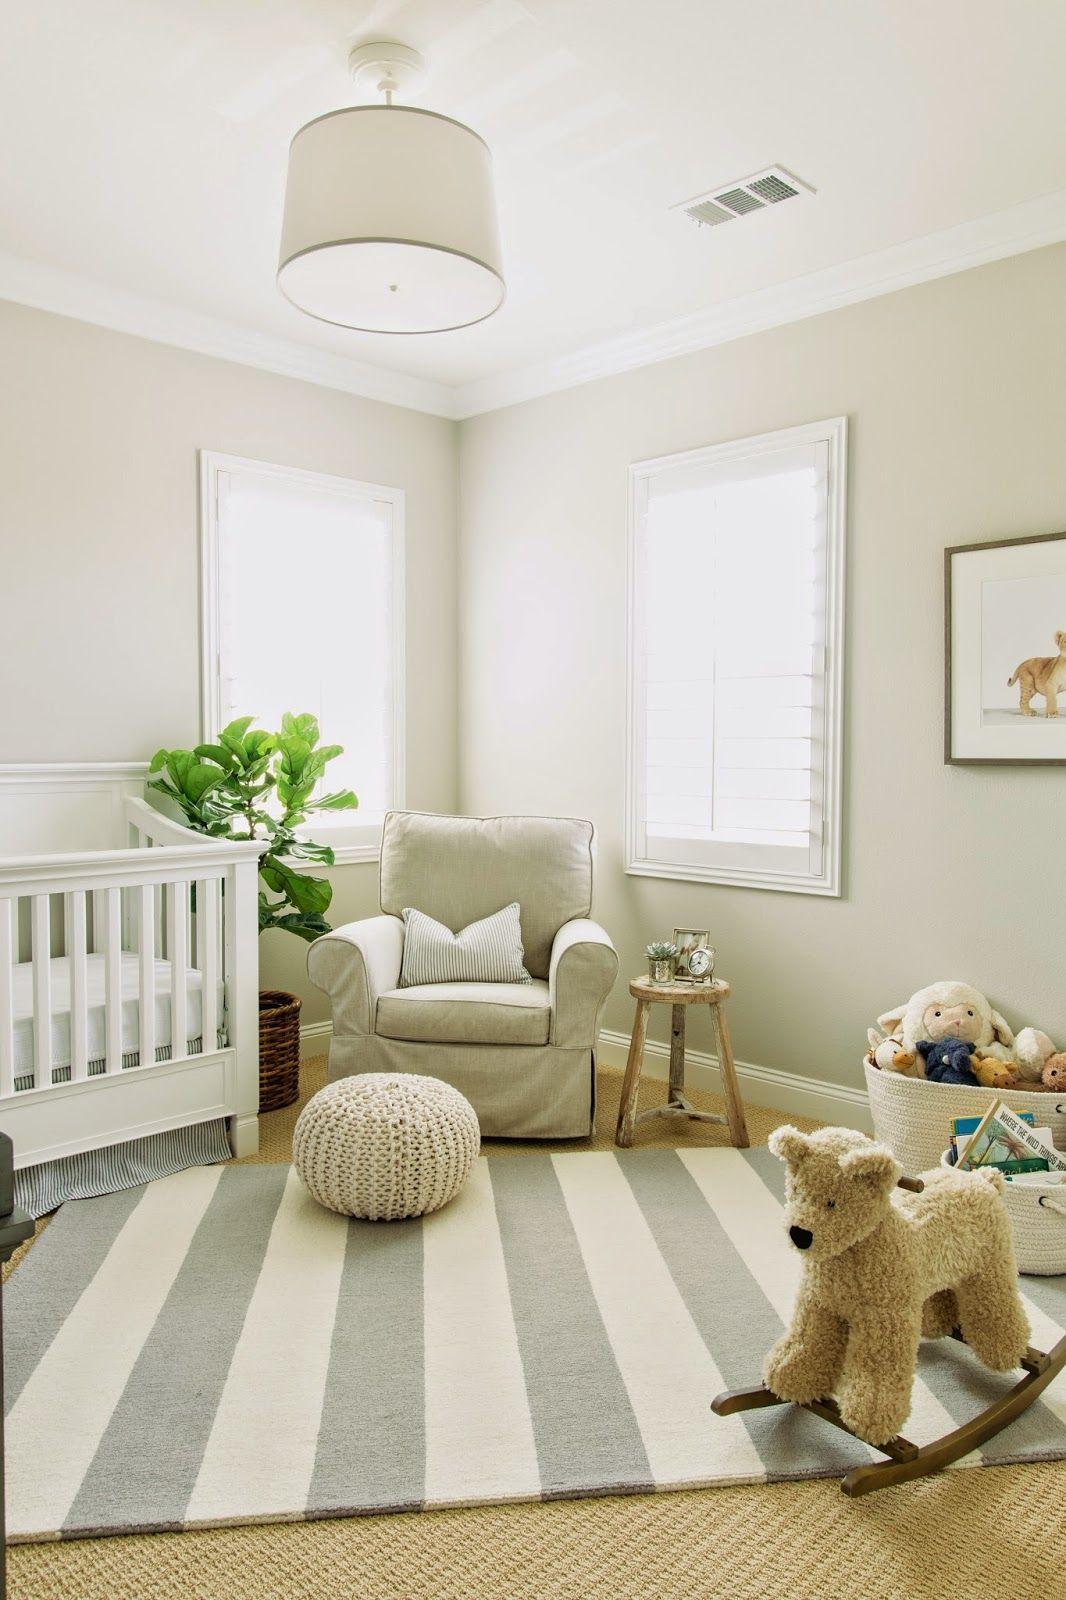 101 Adorable Ideas for a Gender Neutral Nursery